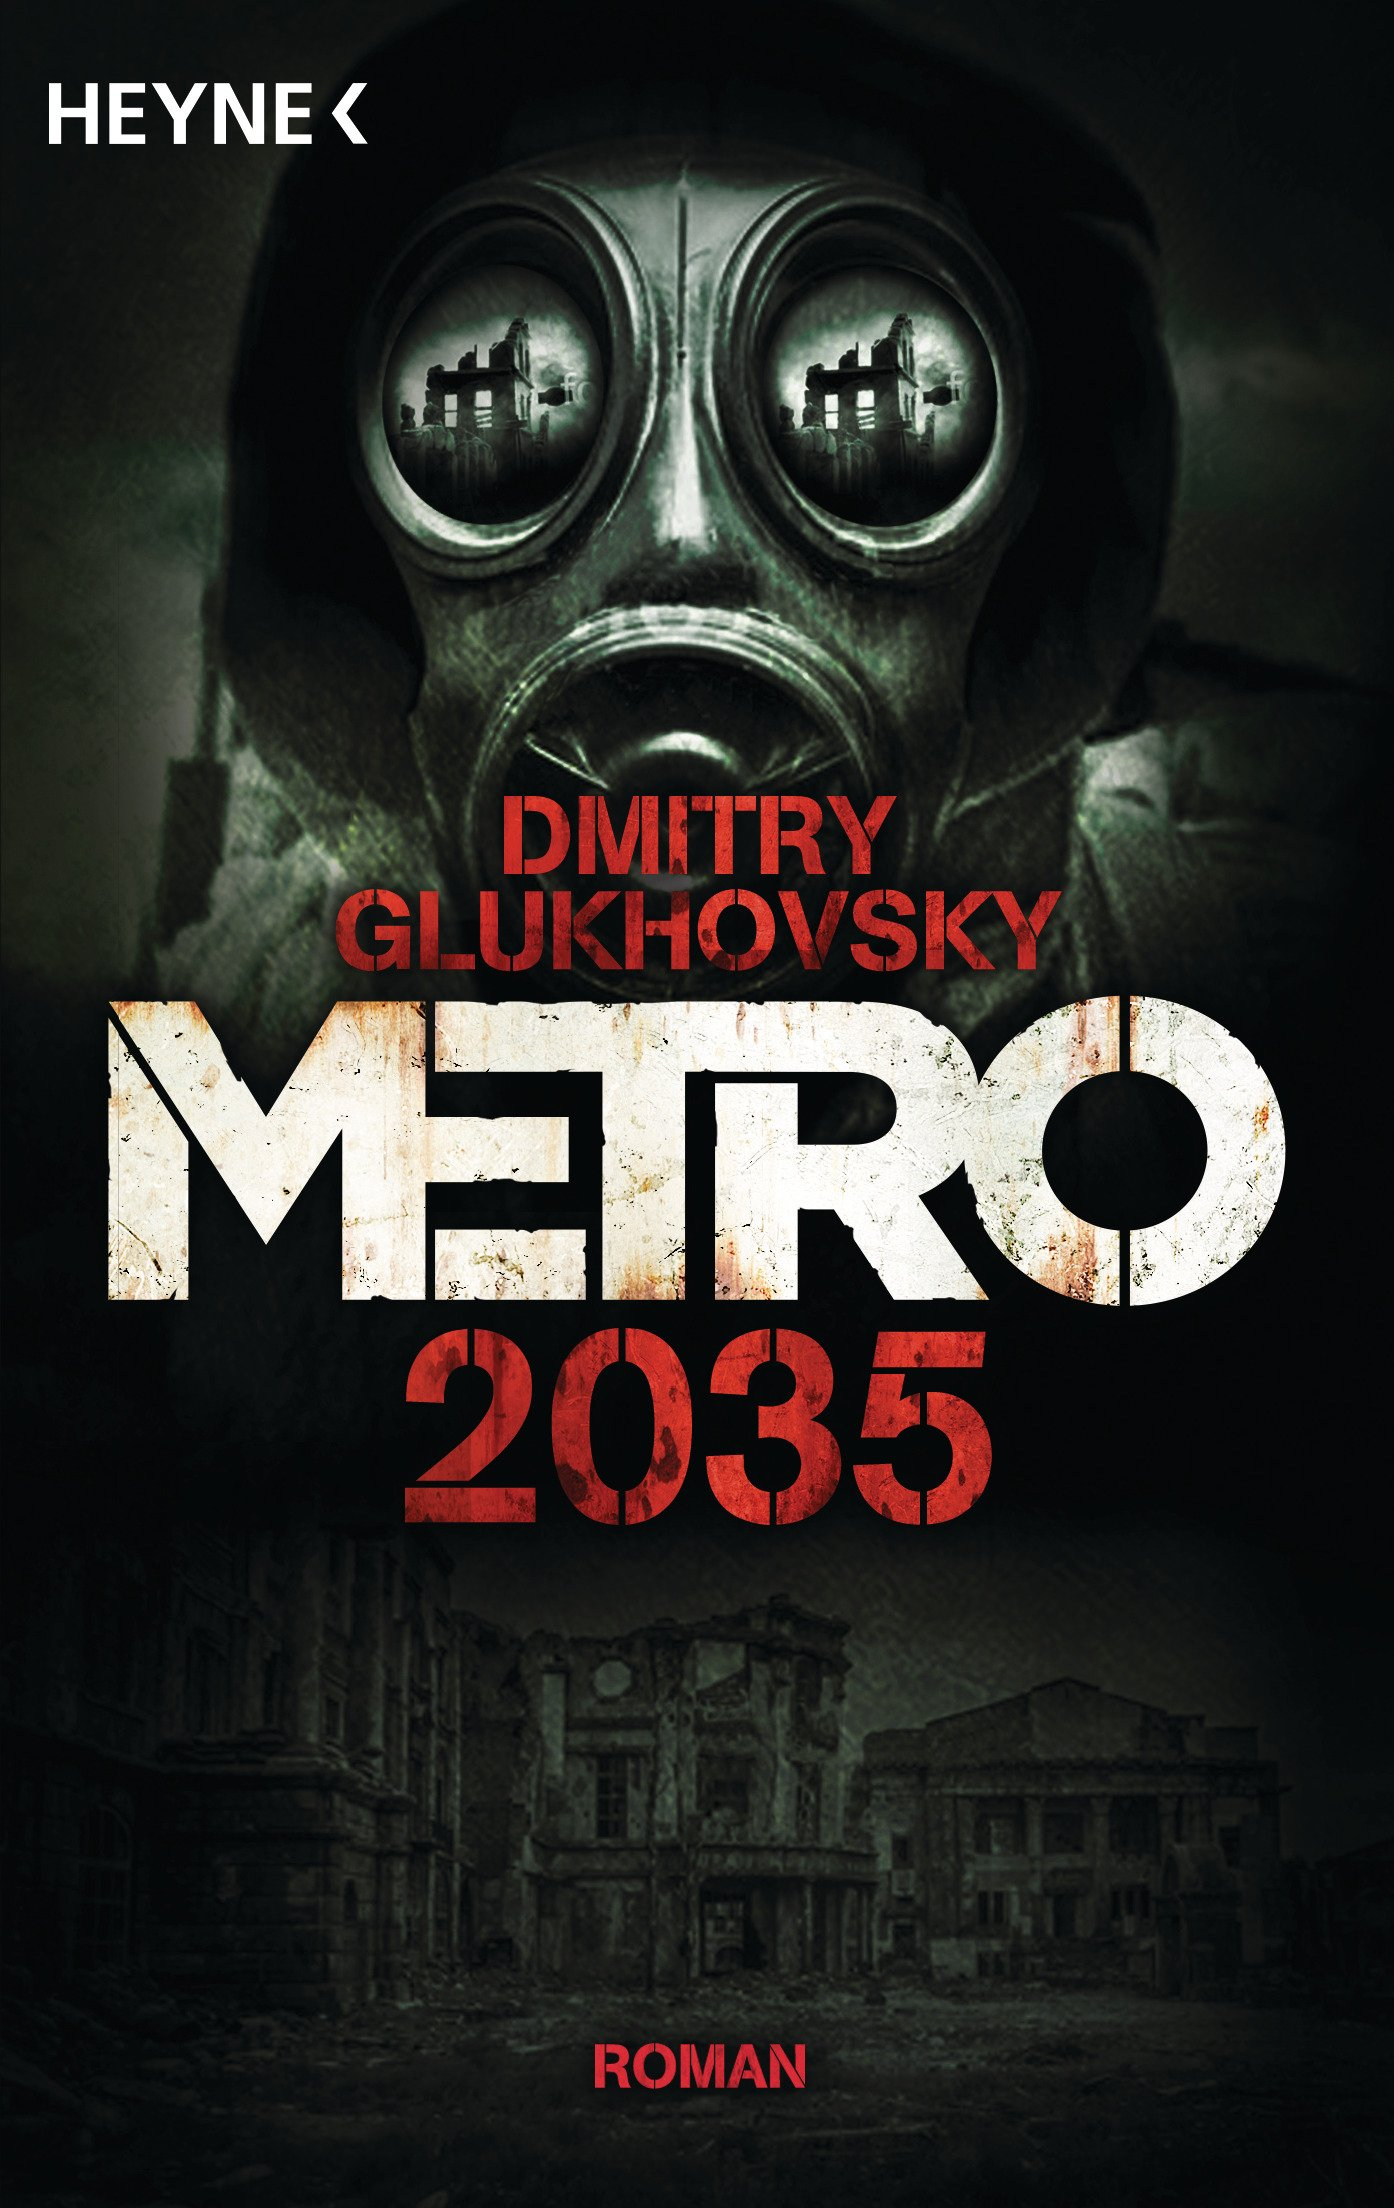 Metro 2035: Roman (Metro-Romane, Band 3) (Englisch) Taschenbuch – 9. Januar 2018 Dmitry Glukhovsky M. David Drevs Heyne Verlag 3453319028